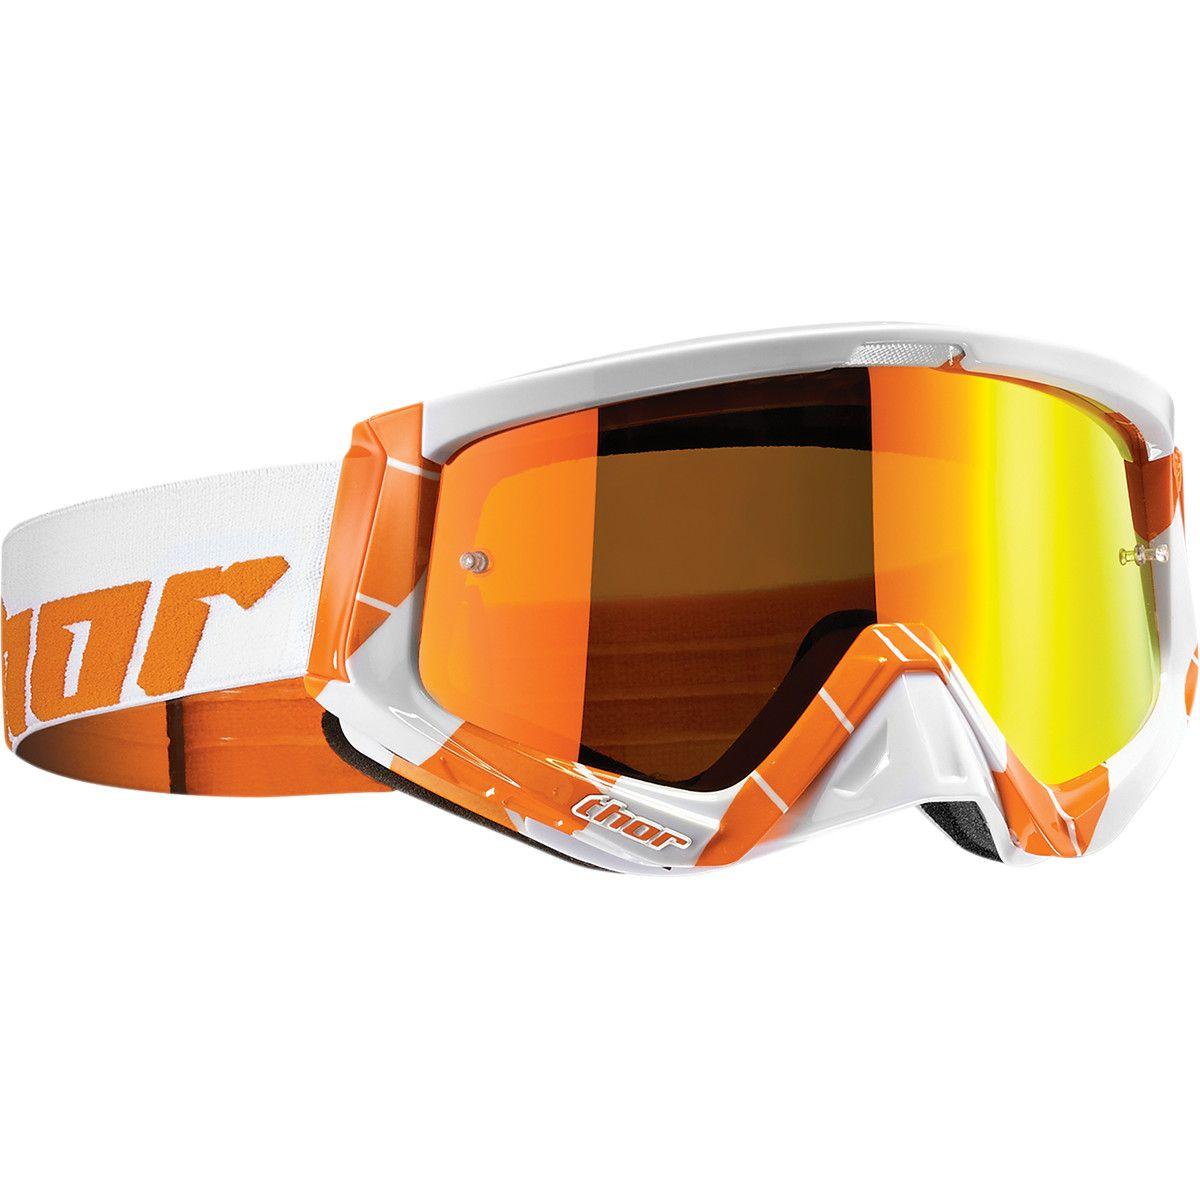 Thor - 2016 Sniper Chase очки, оранжево-белые